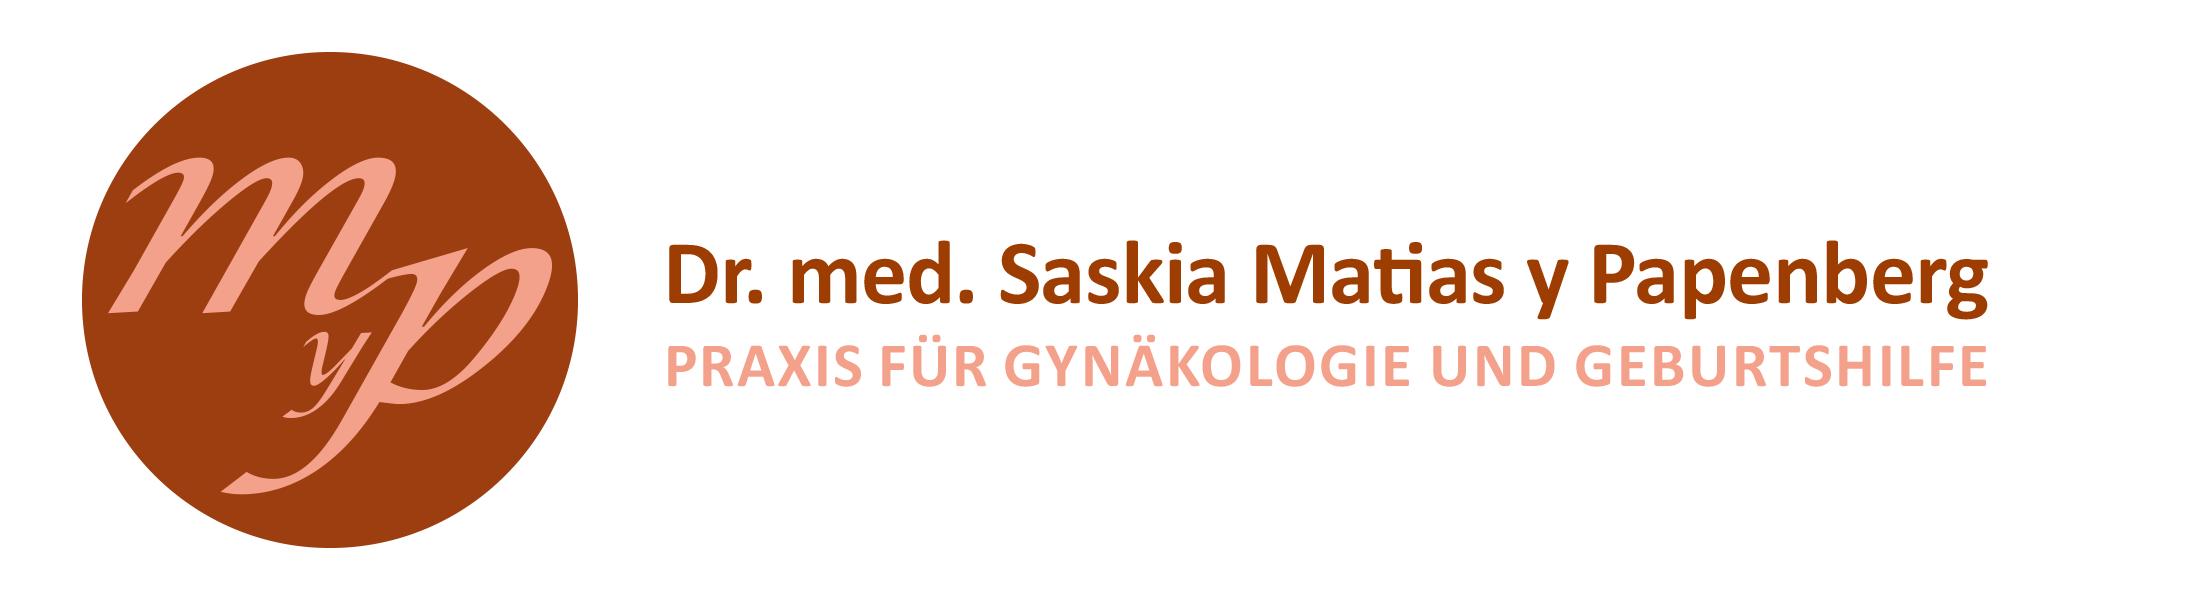 Praxis Dr. med. Saskia Matias y Papenberg